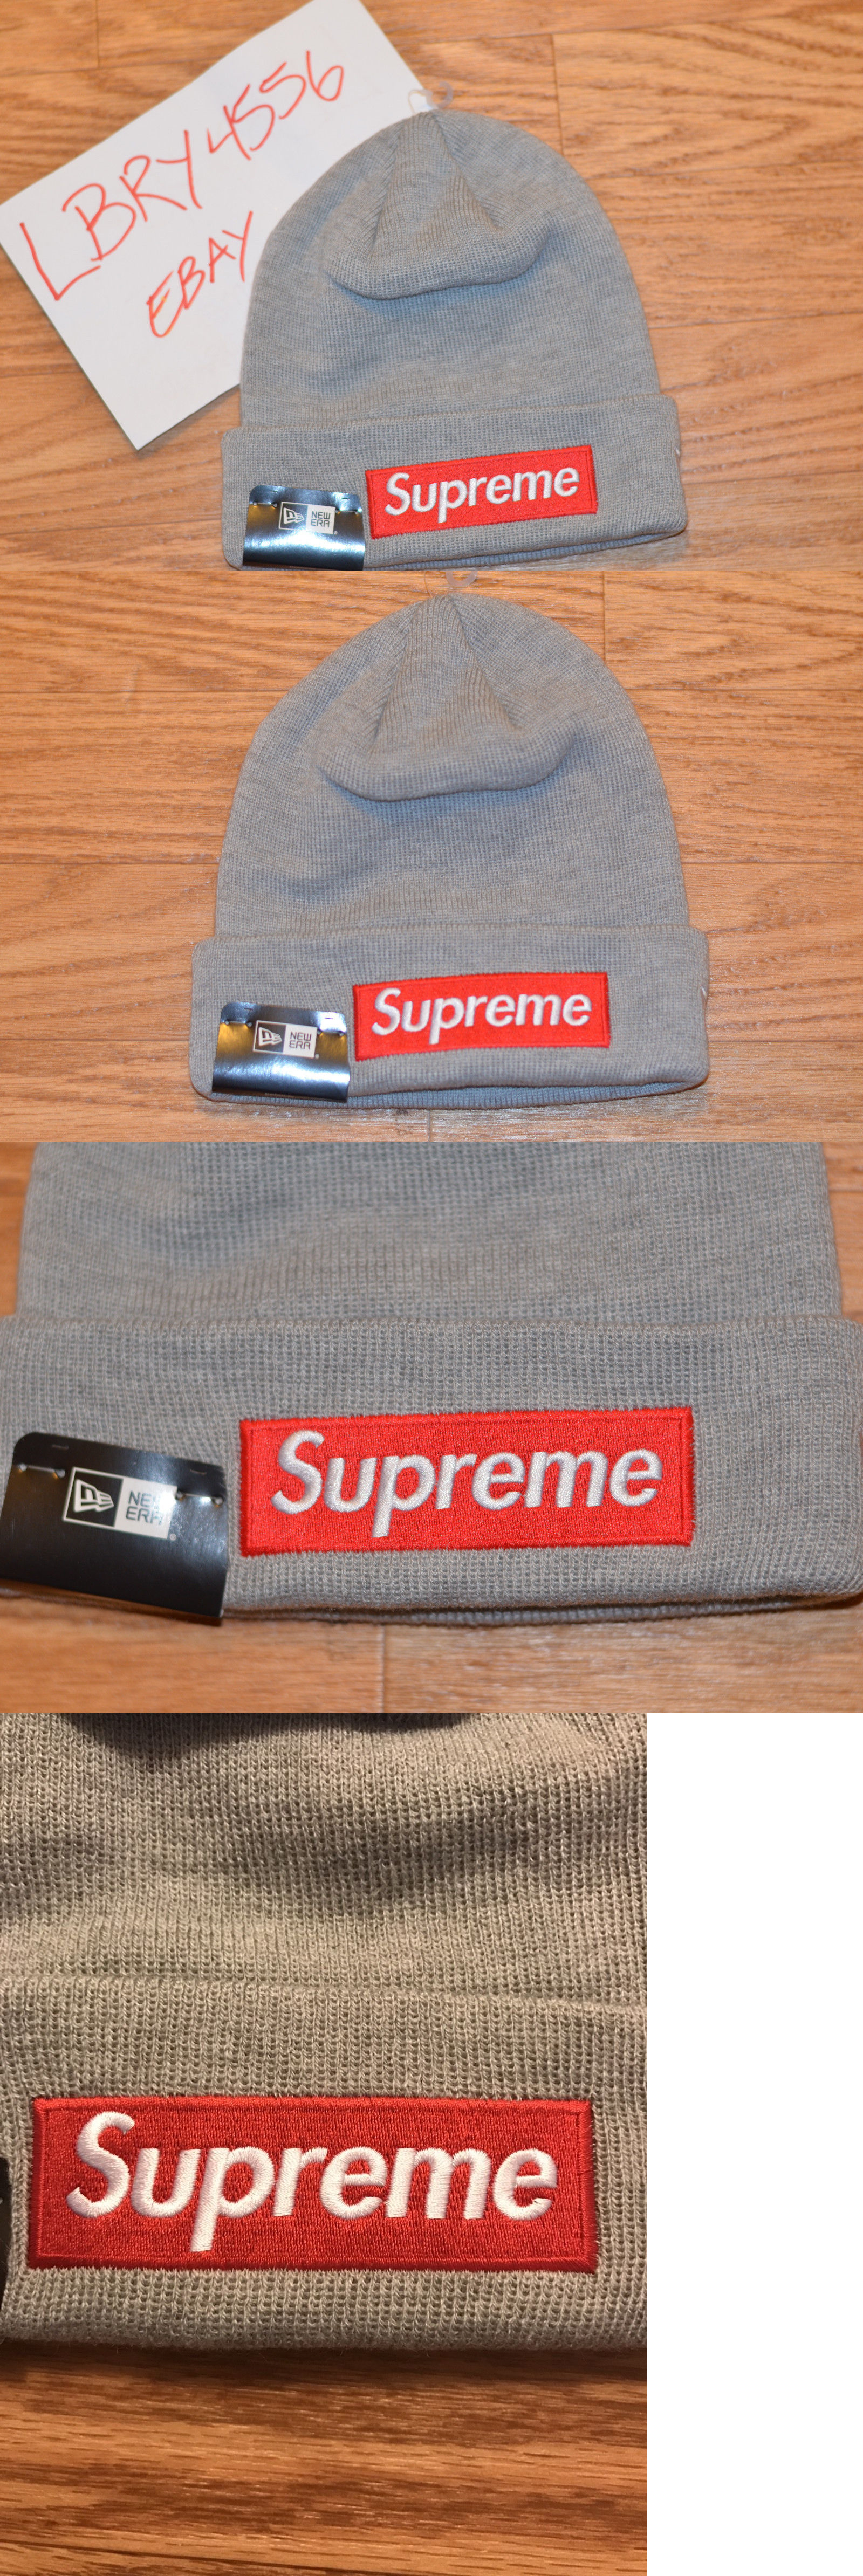 Hats 52365  Supreme X New Era Box Logo Bogo Beanie Hat Cap Grey 16Fw -  BUY  IT NOW ONLY   39 on eBay! e5a3e37d544